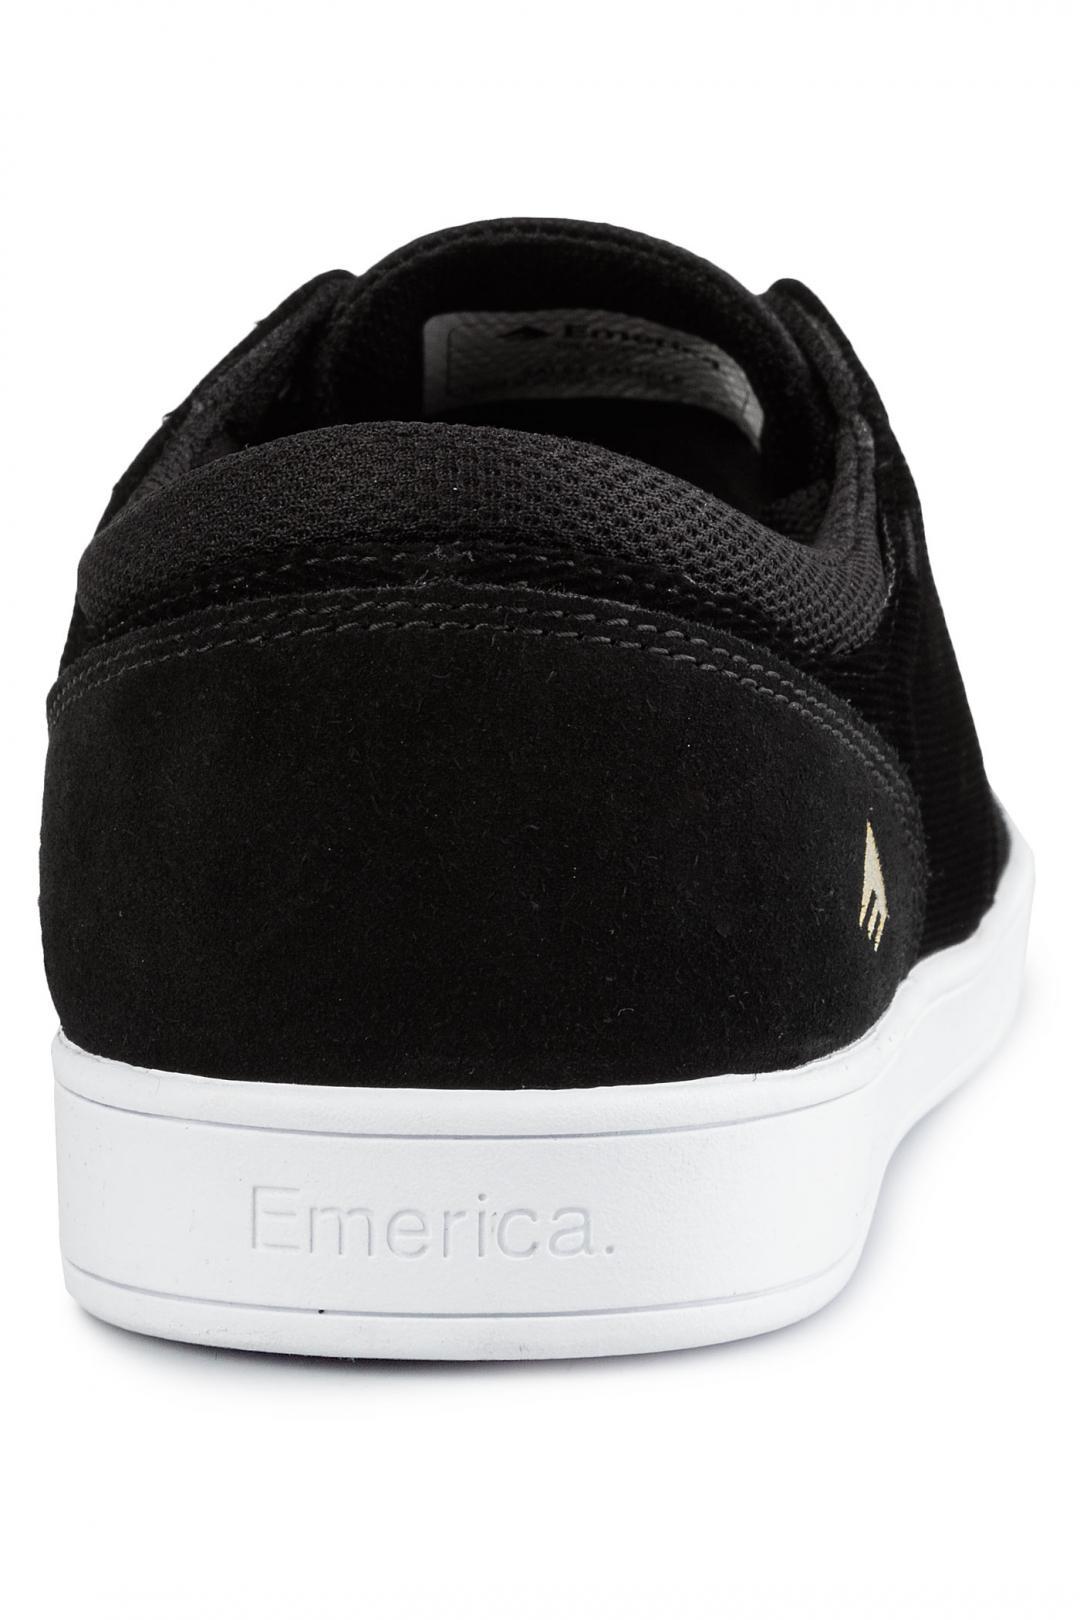 Uomo Emerica The Figueroa black | Sneakers low top